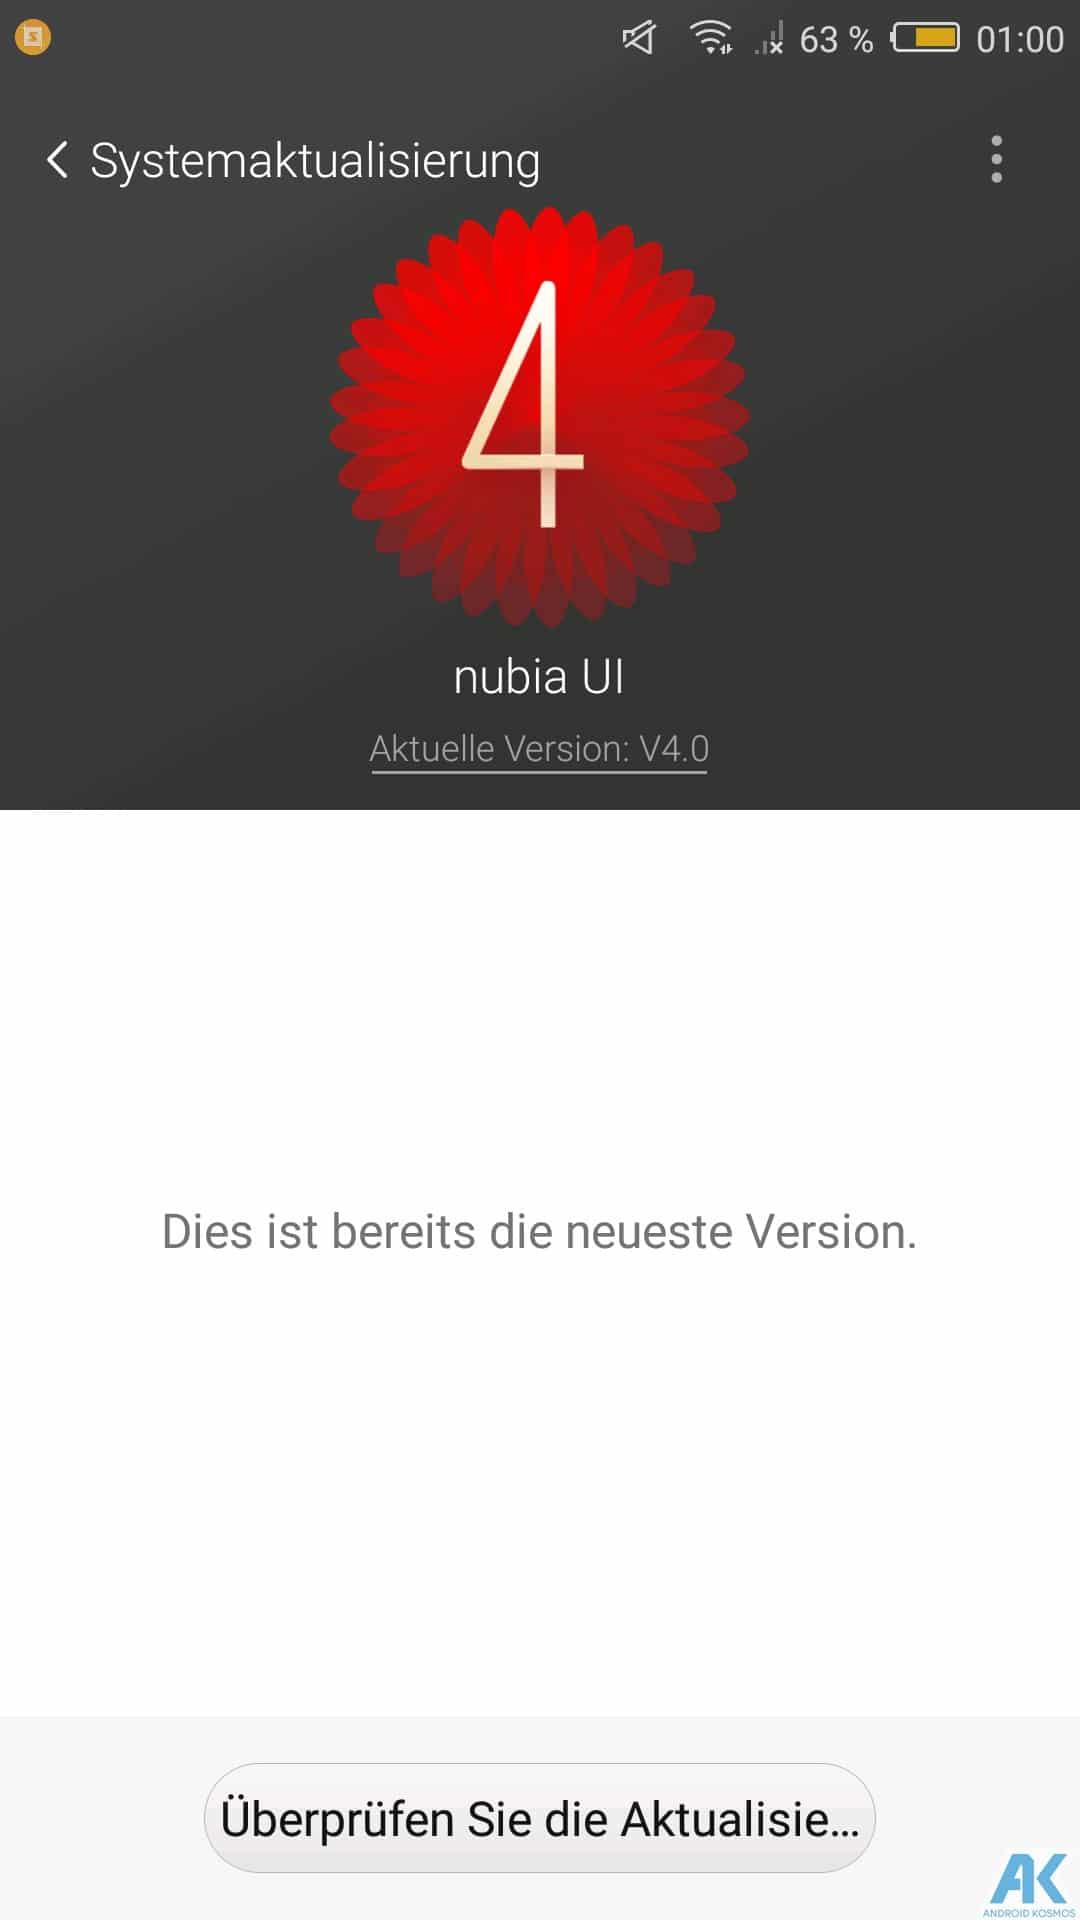 Nubia Z11 Mini S Test: kompaktes Mittelklasse Smartphone 25